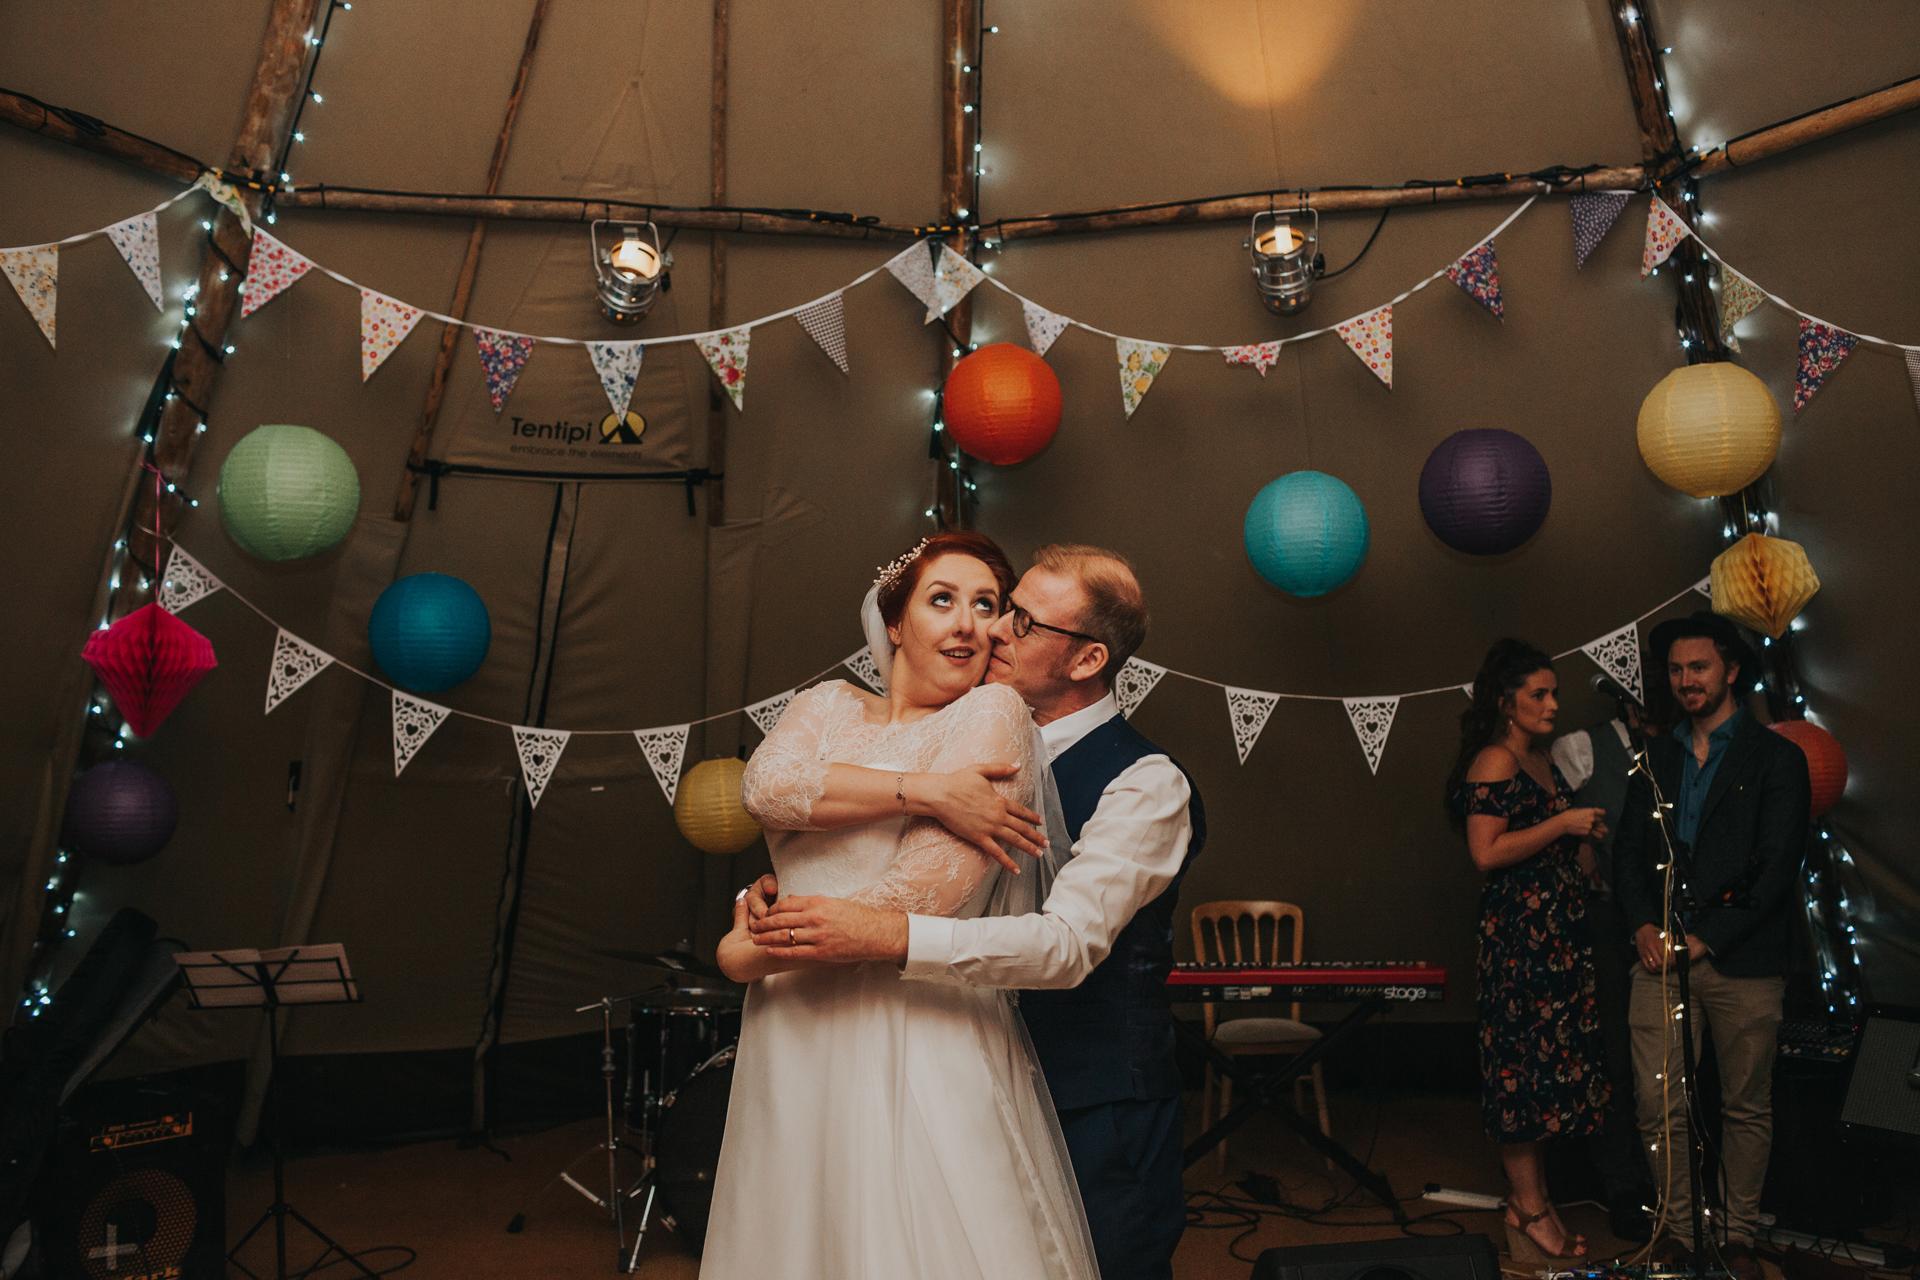 Bride and groom twirl and kiss on dance floor.